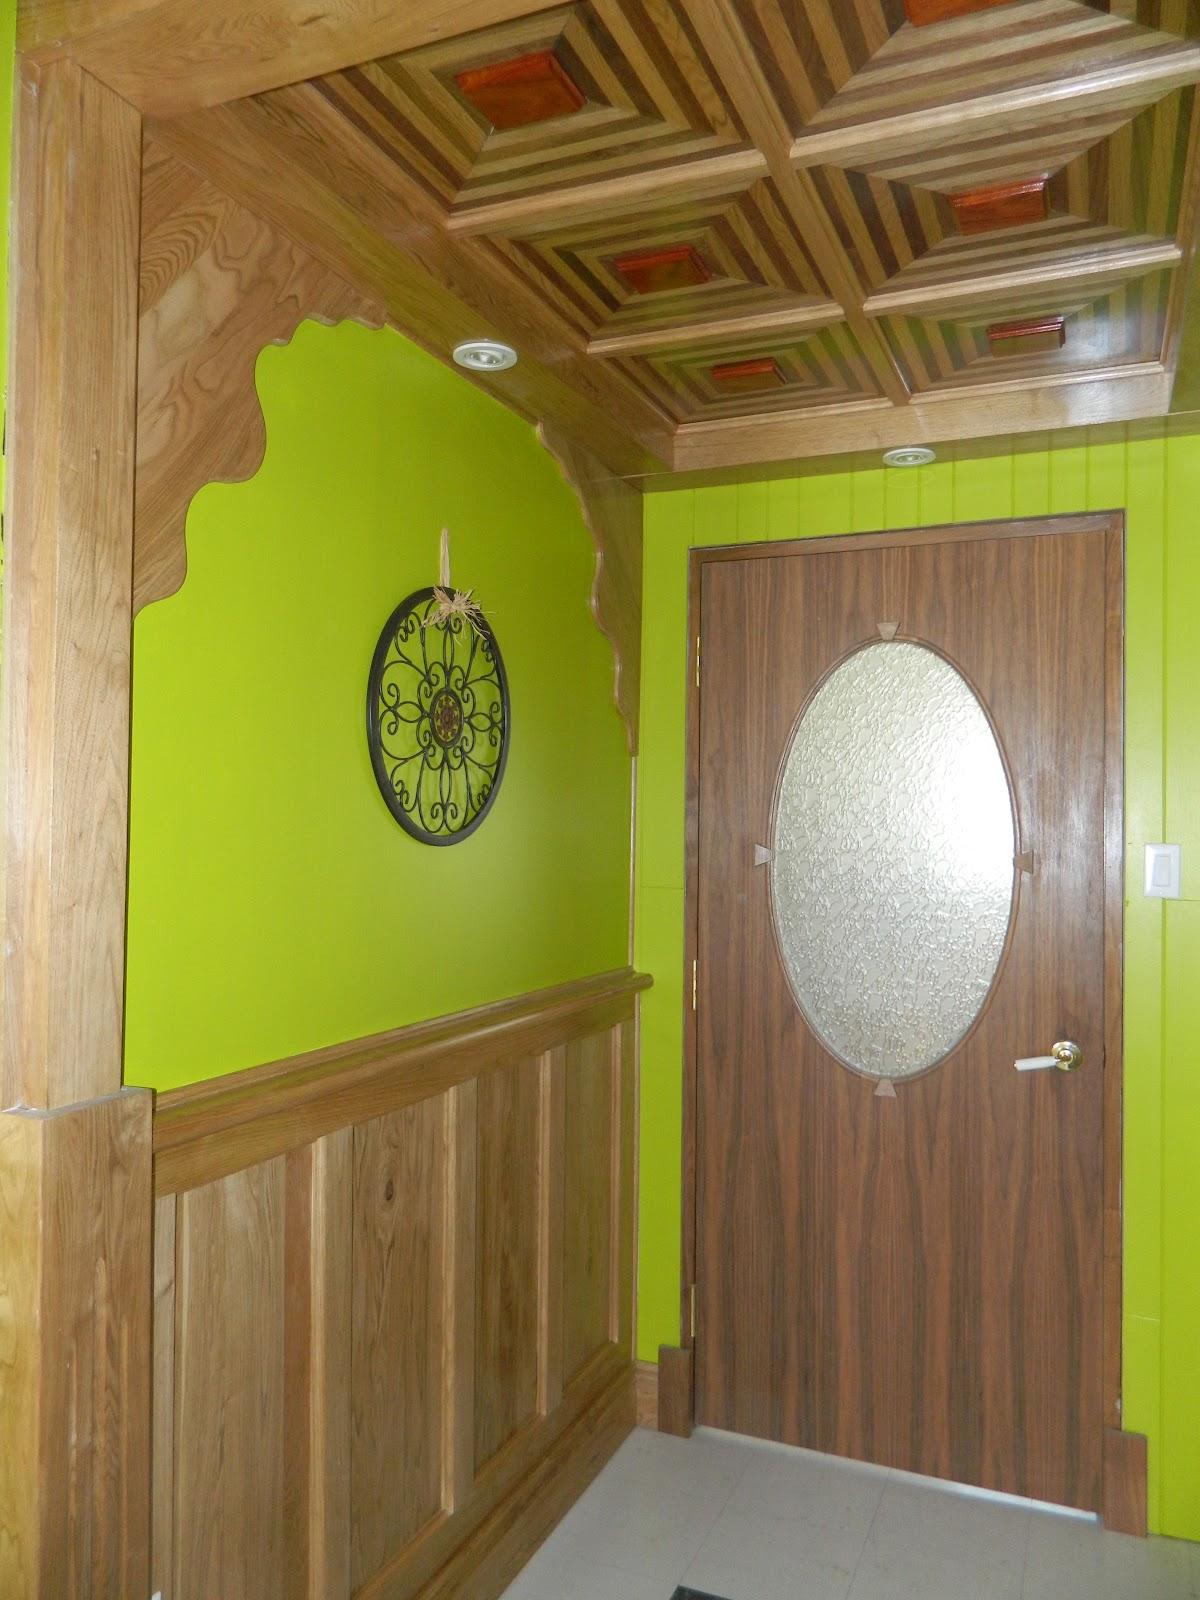 menuiserie st m thode caisson mural en bois. Black Bedroom Furniture Sets. Home Design Ideas